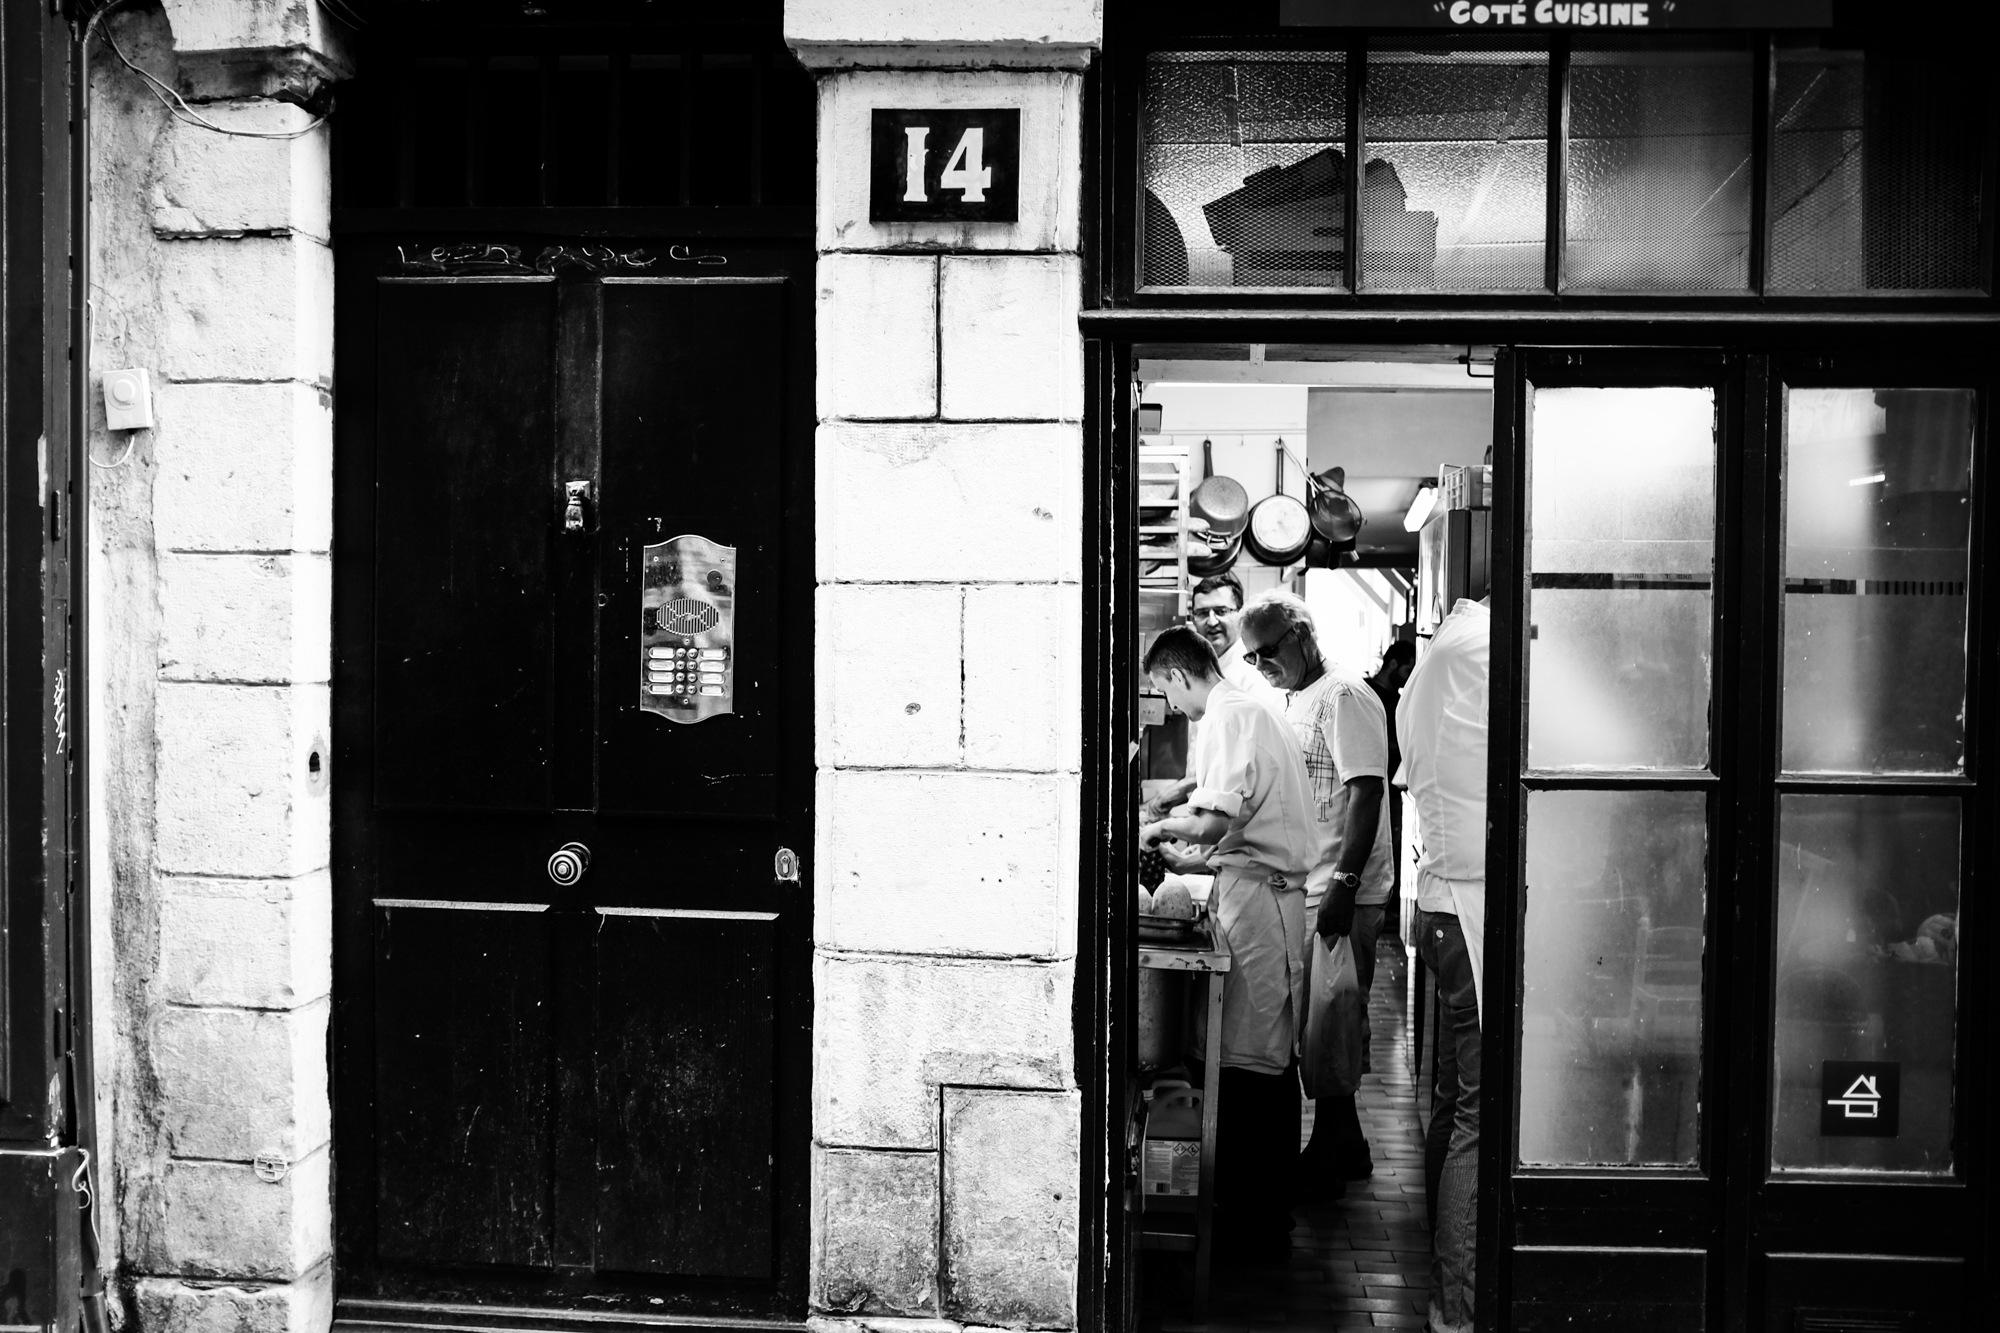 Commis chef. by Cédric Ortiz